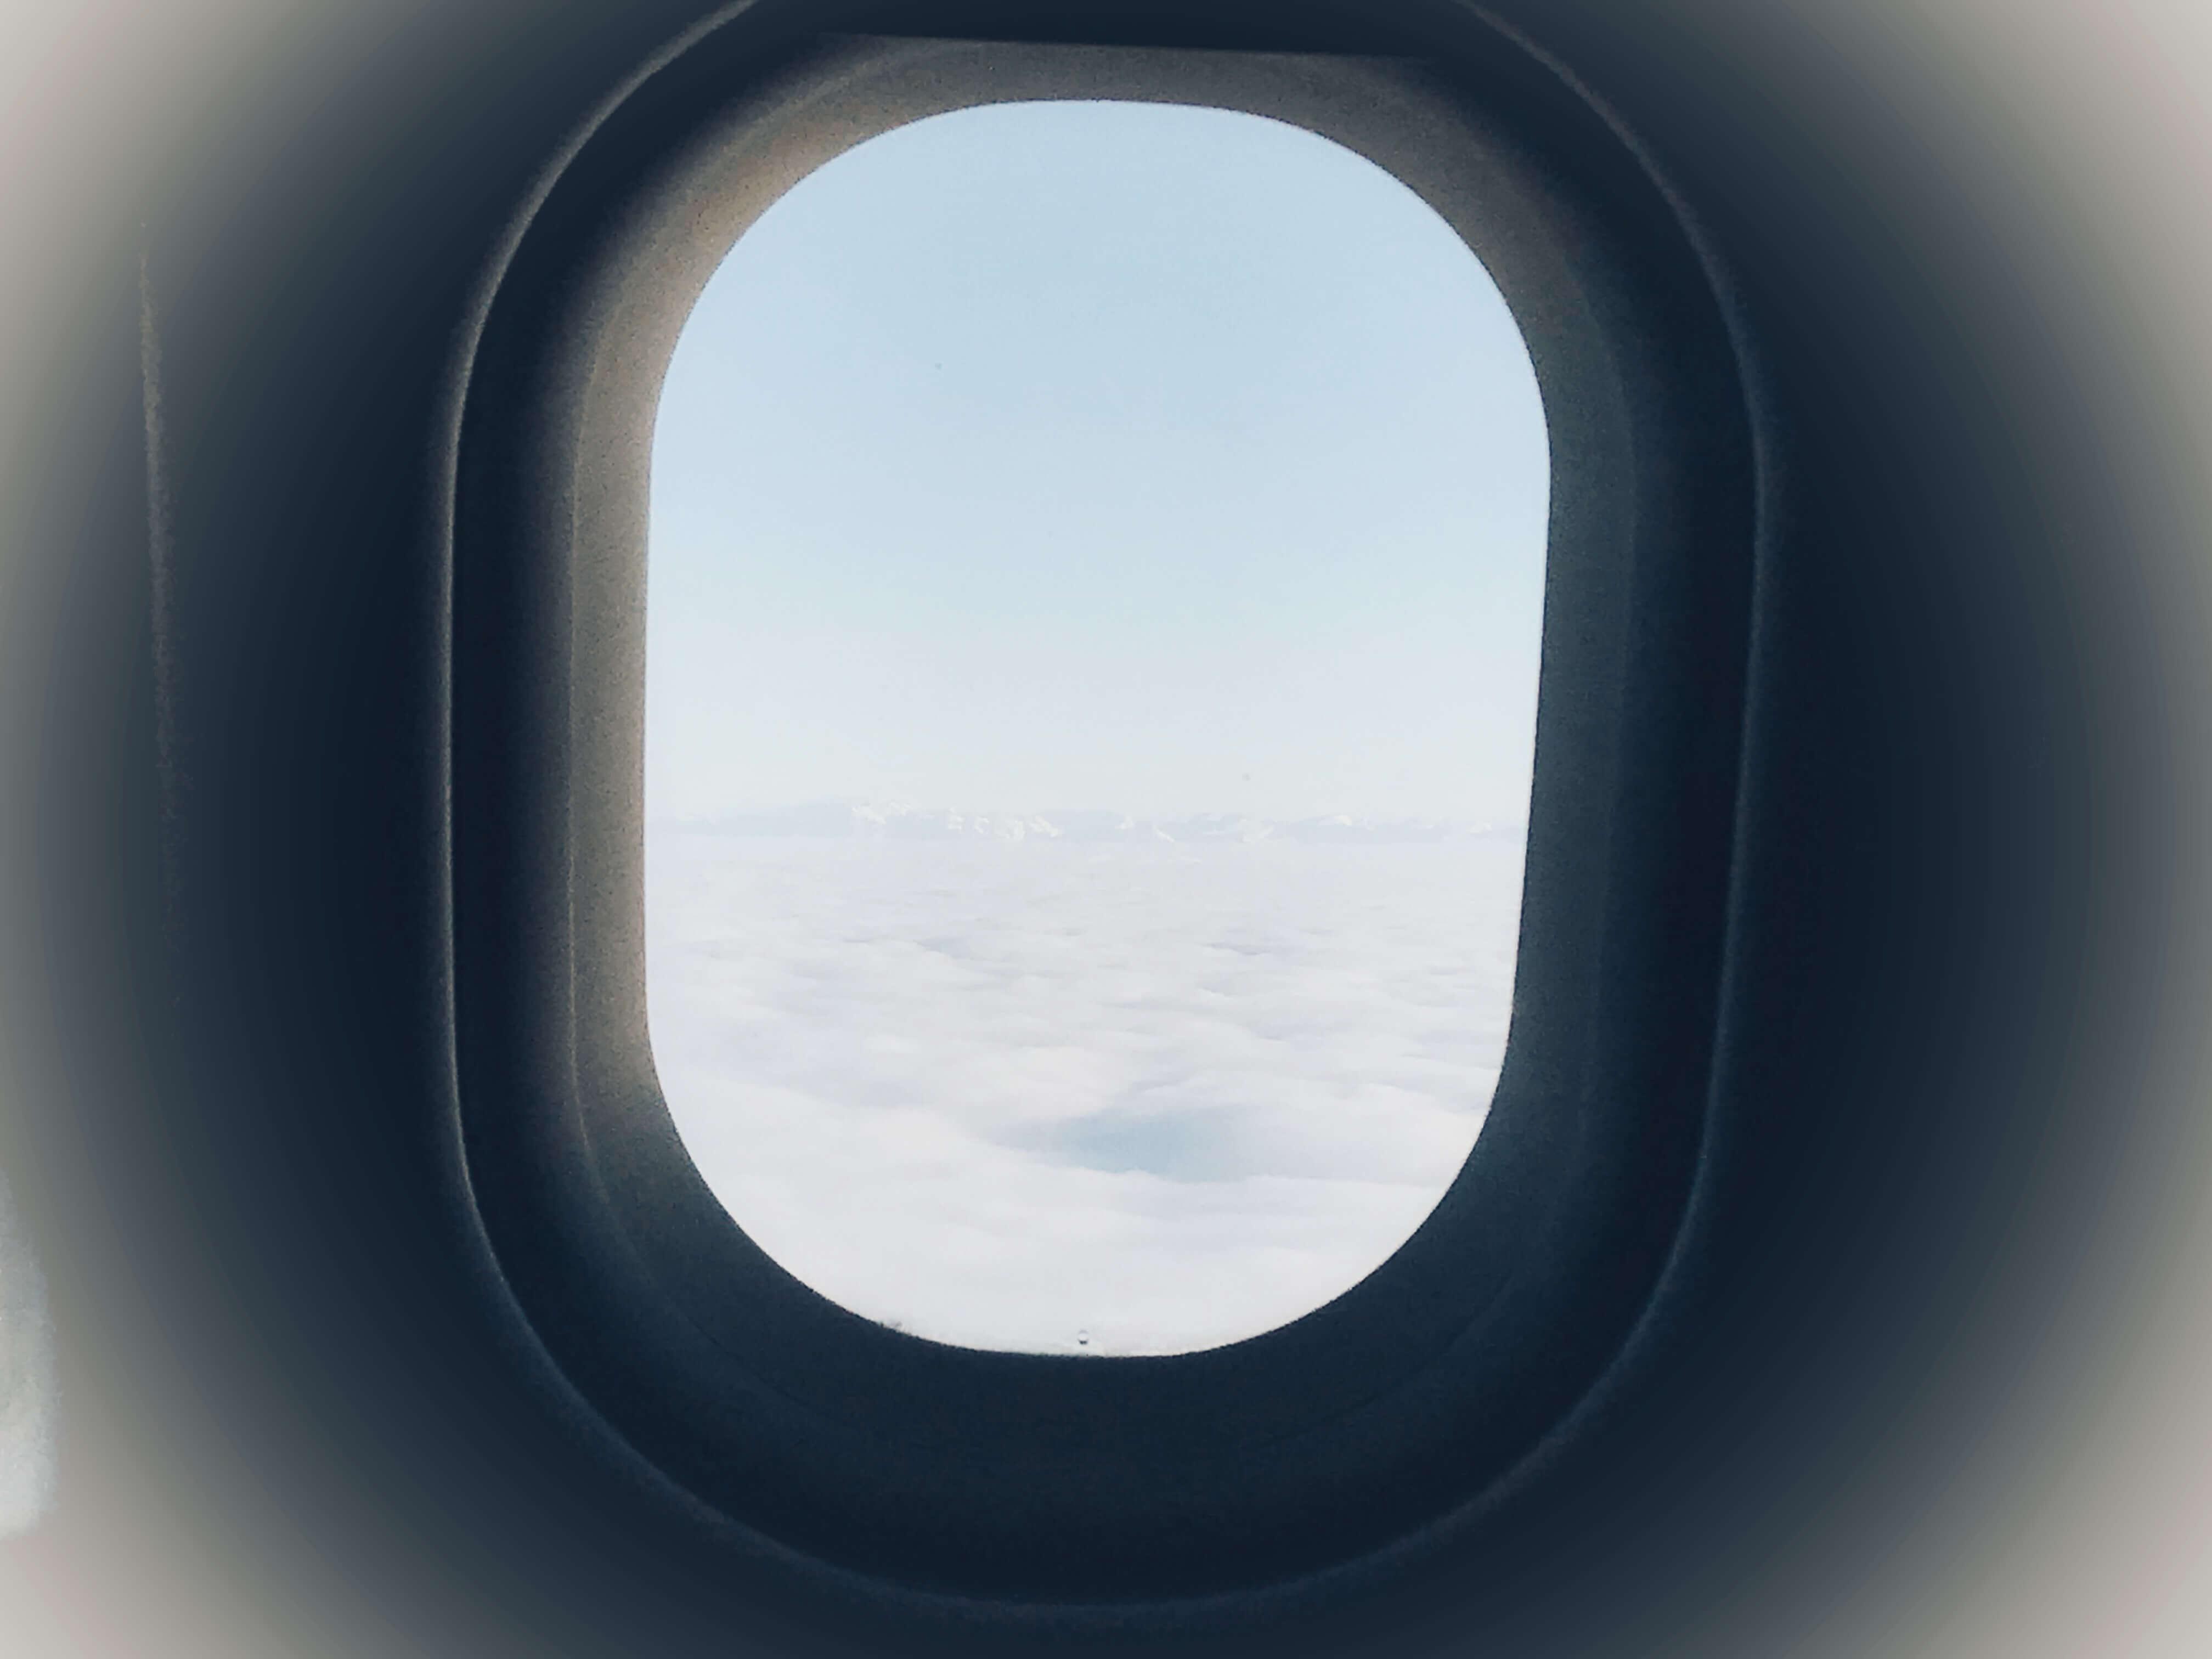 Flugzeug Annaway Anna Travelblog Lifestyle 3